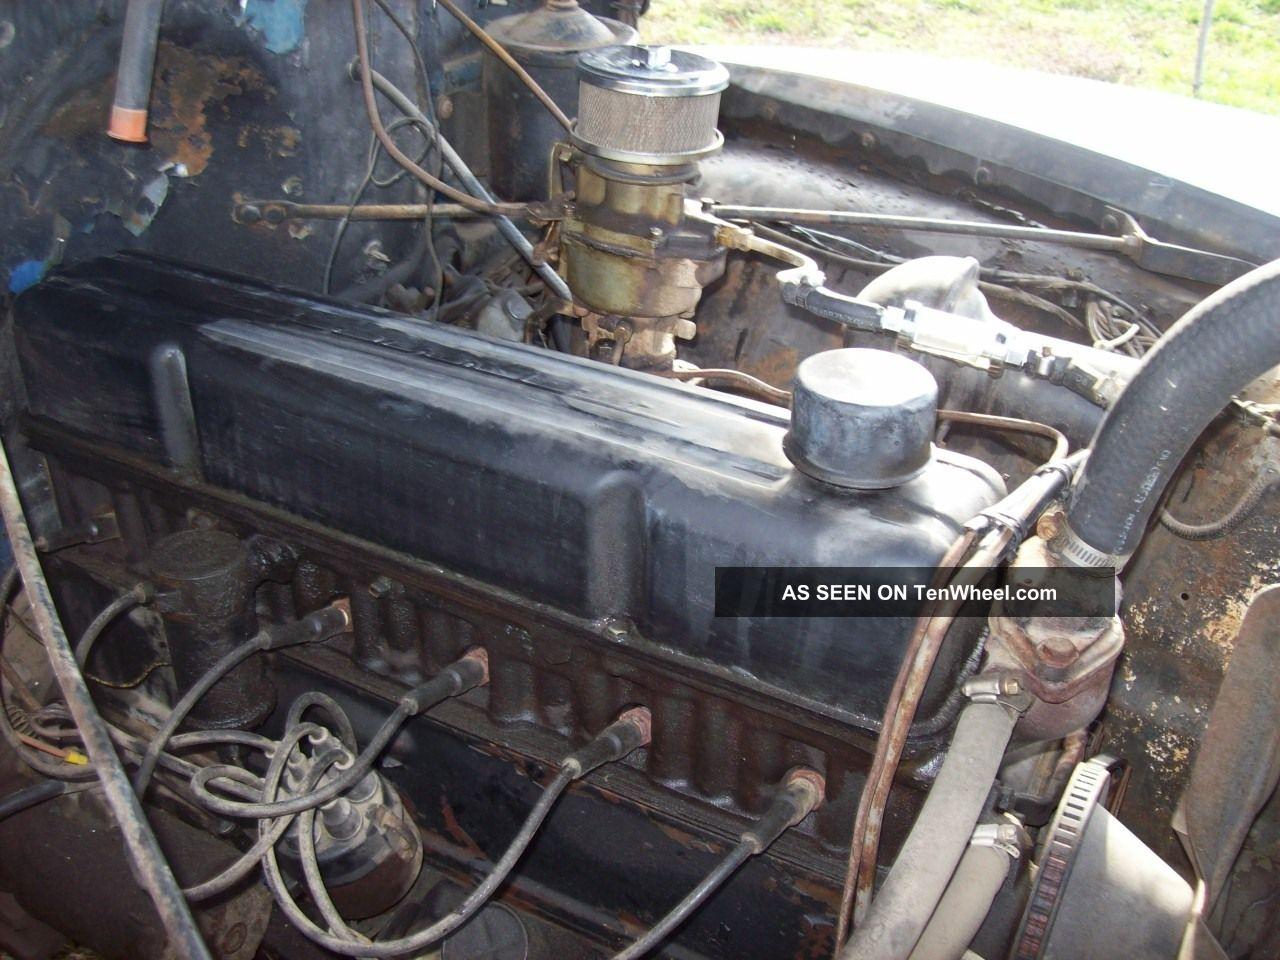 Chevy Ton Shortbed Ci Speed Fenton Dual Exhaust Manifold Lgw on 235 6 Cyl Chevy Id